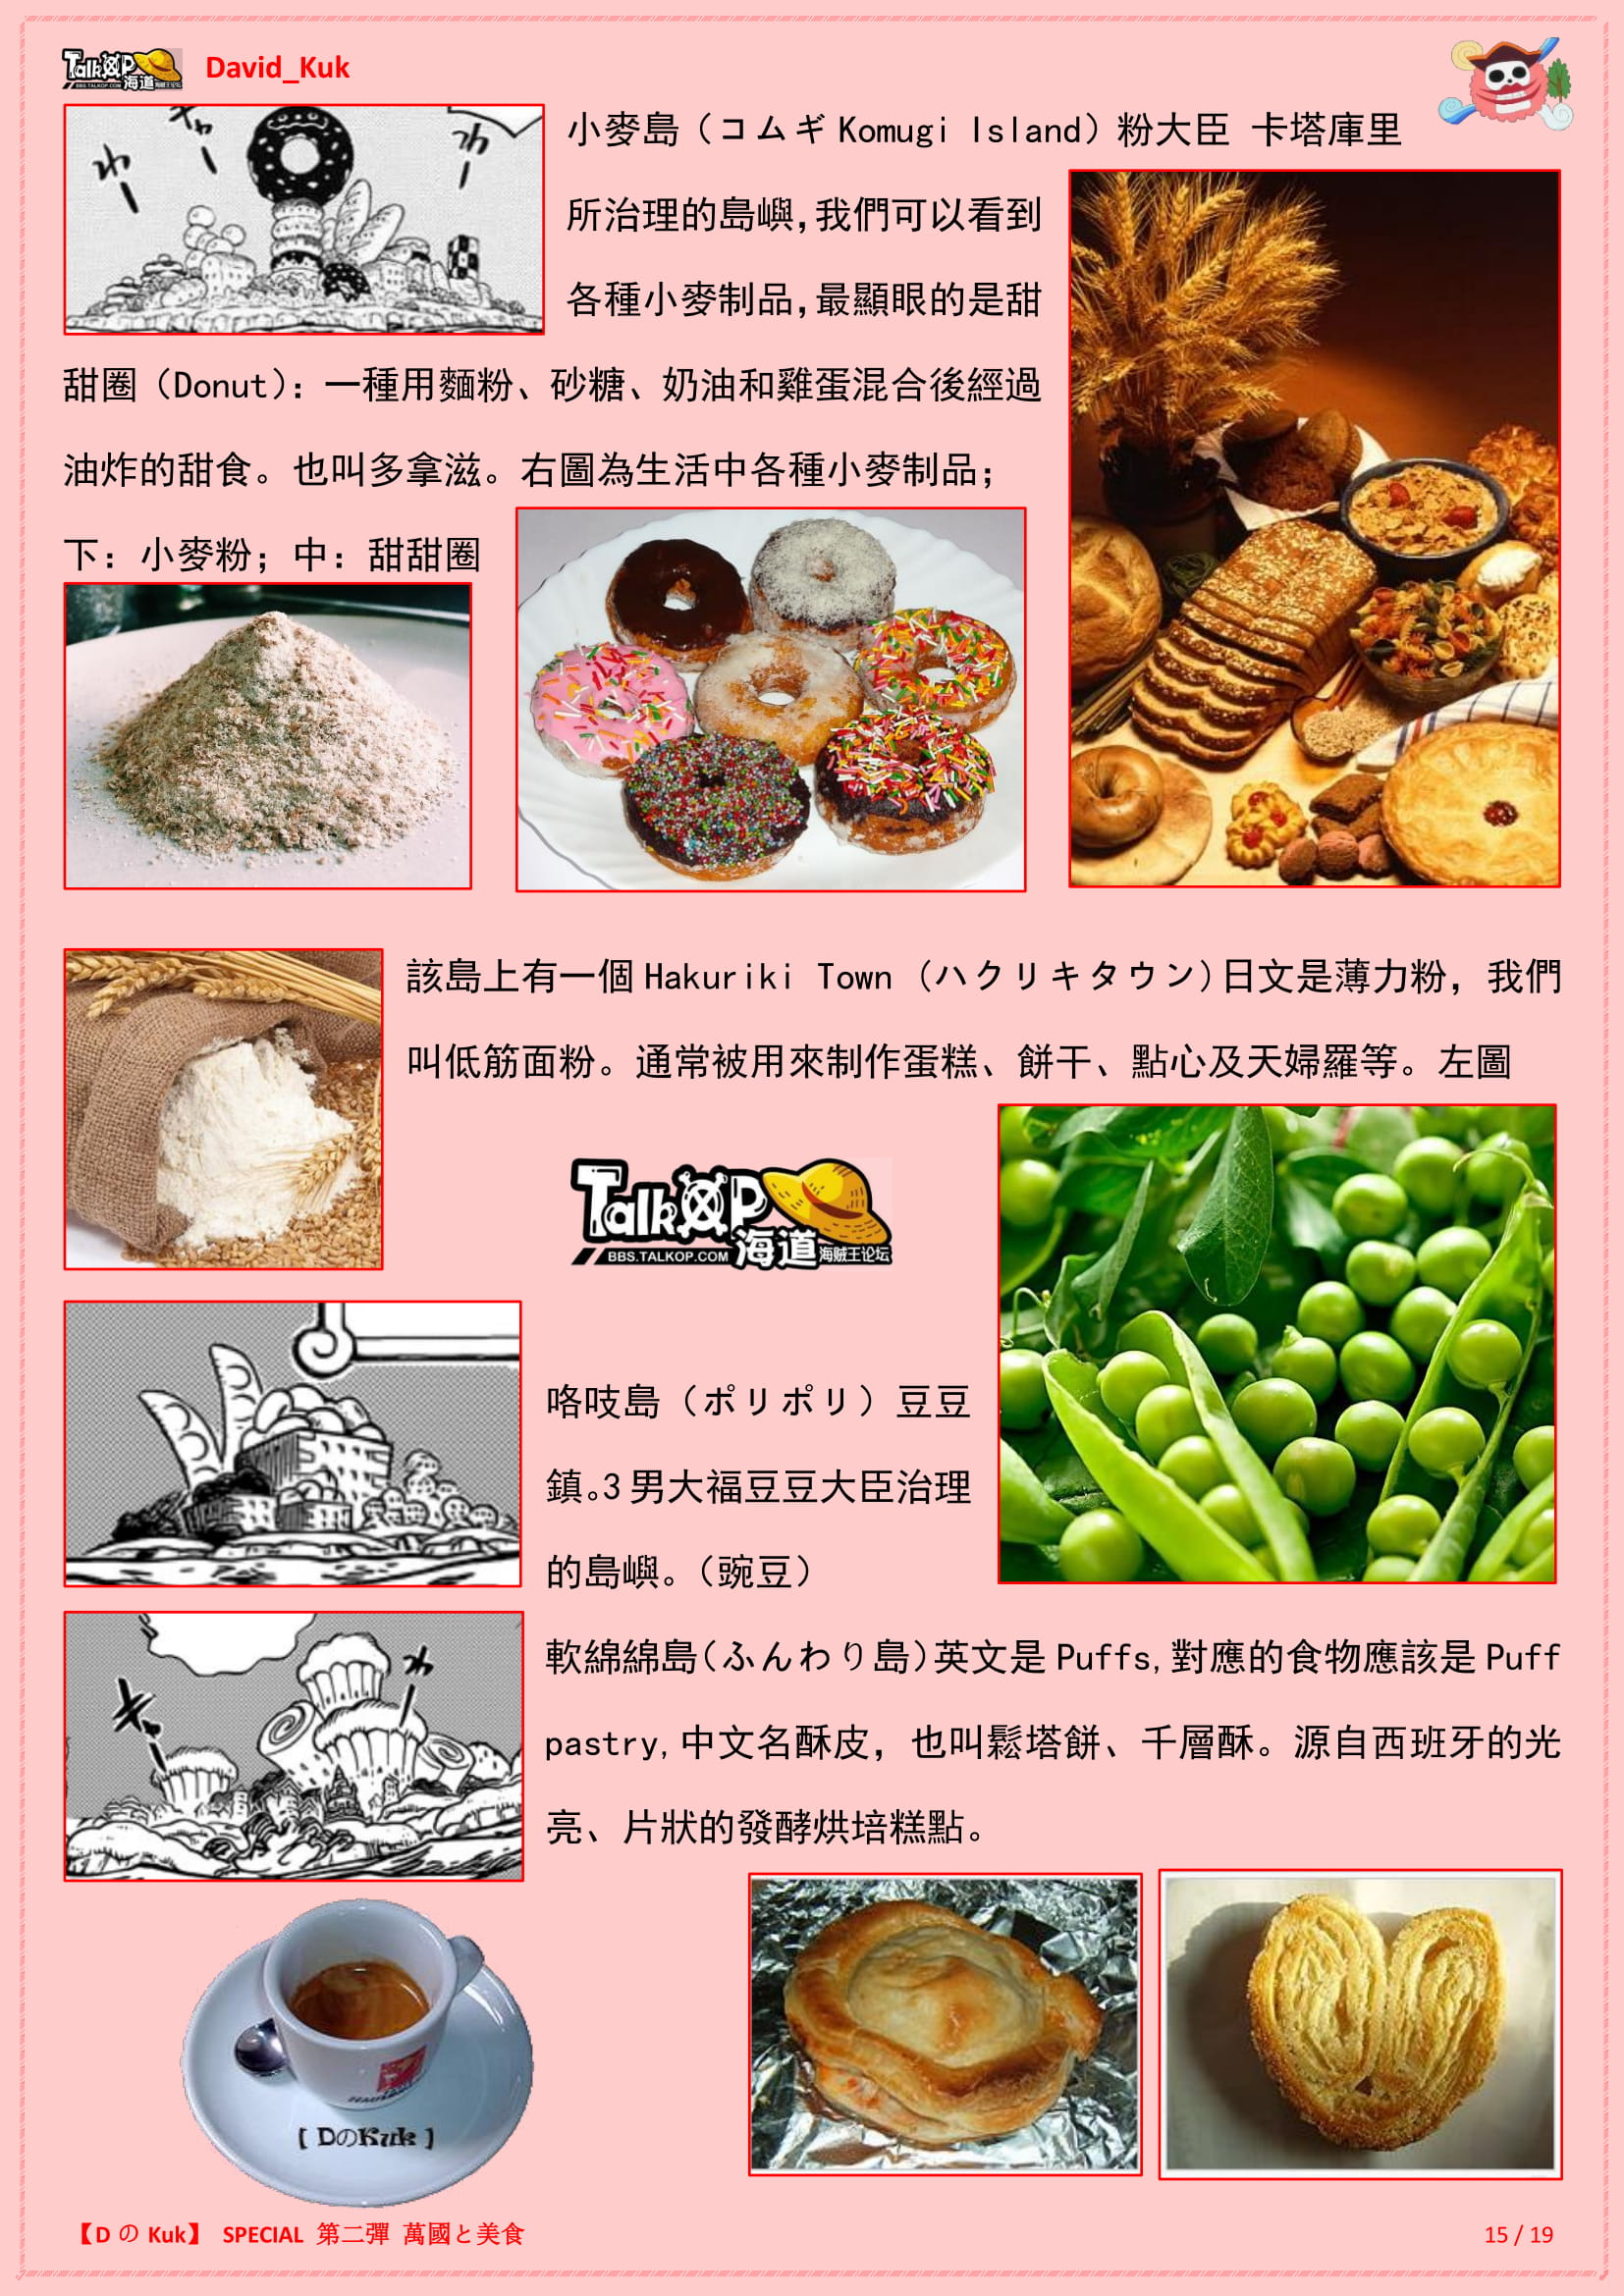 【DのKuk】 SPECIAL 第二彈 萬國と美食-15.jpg